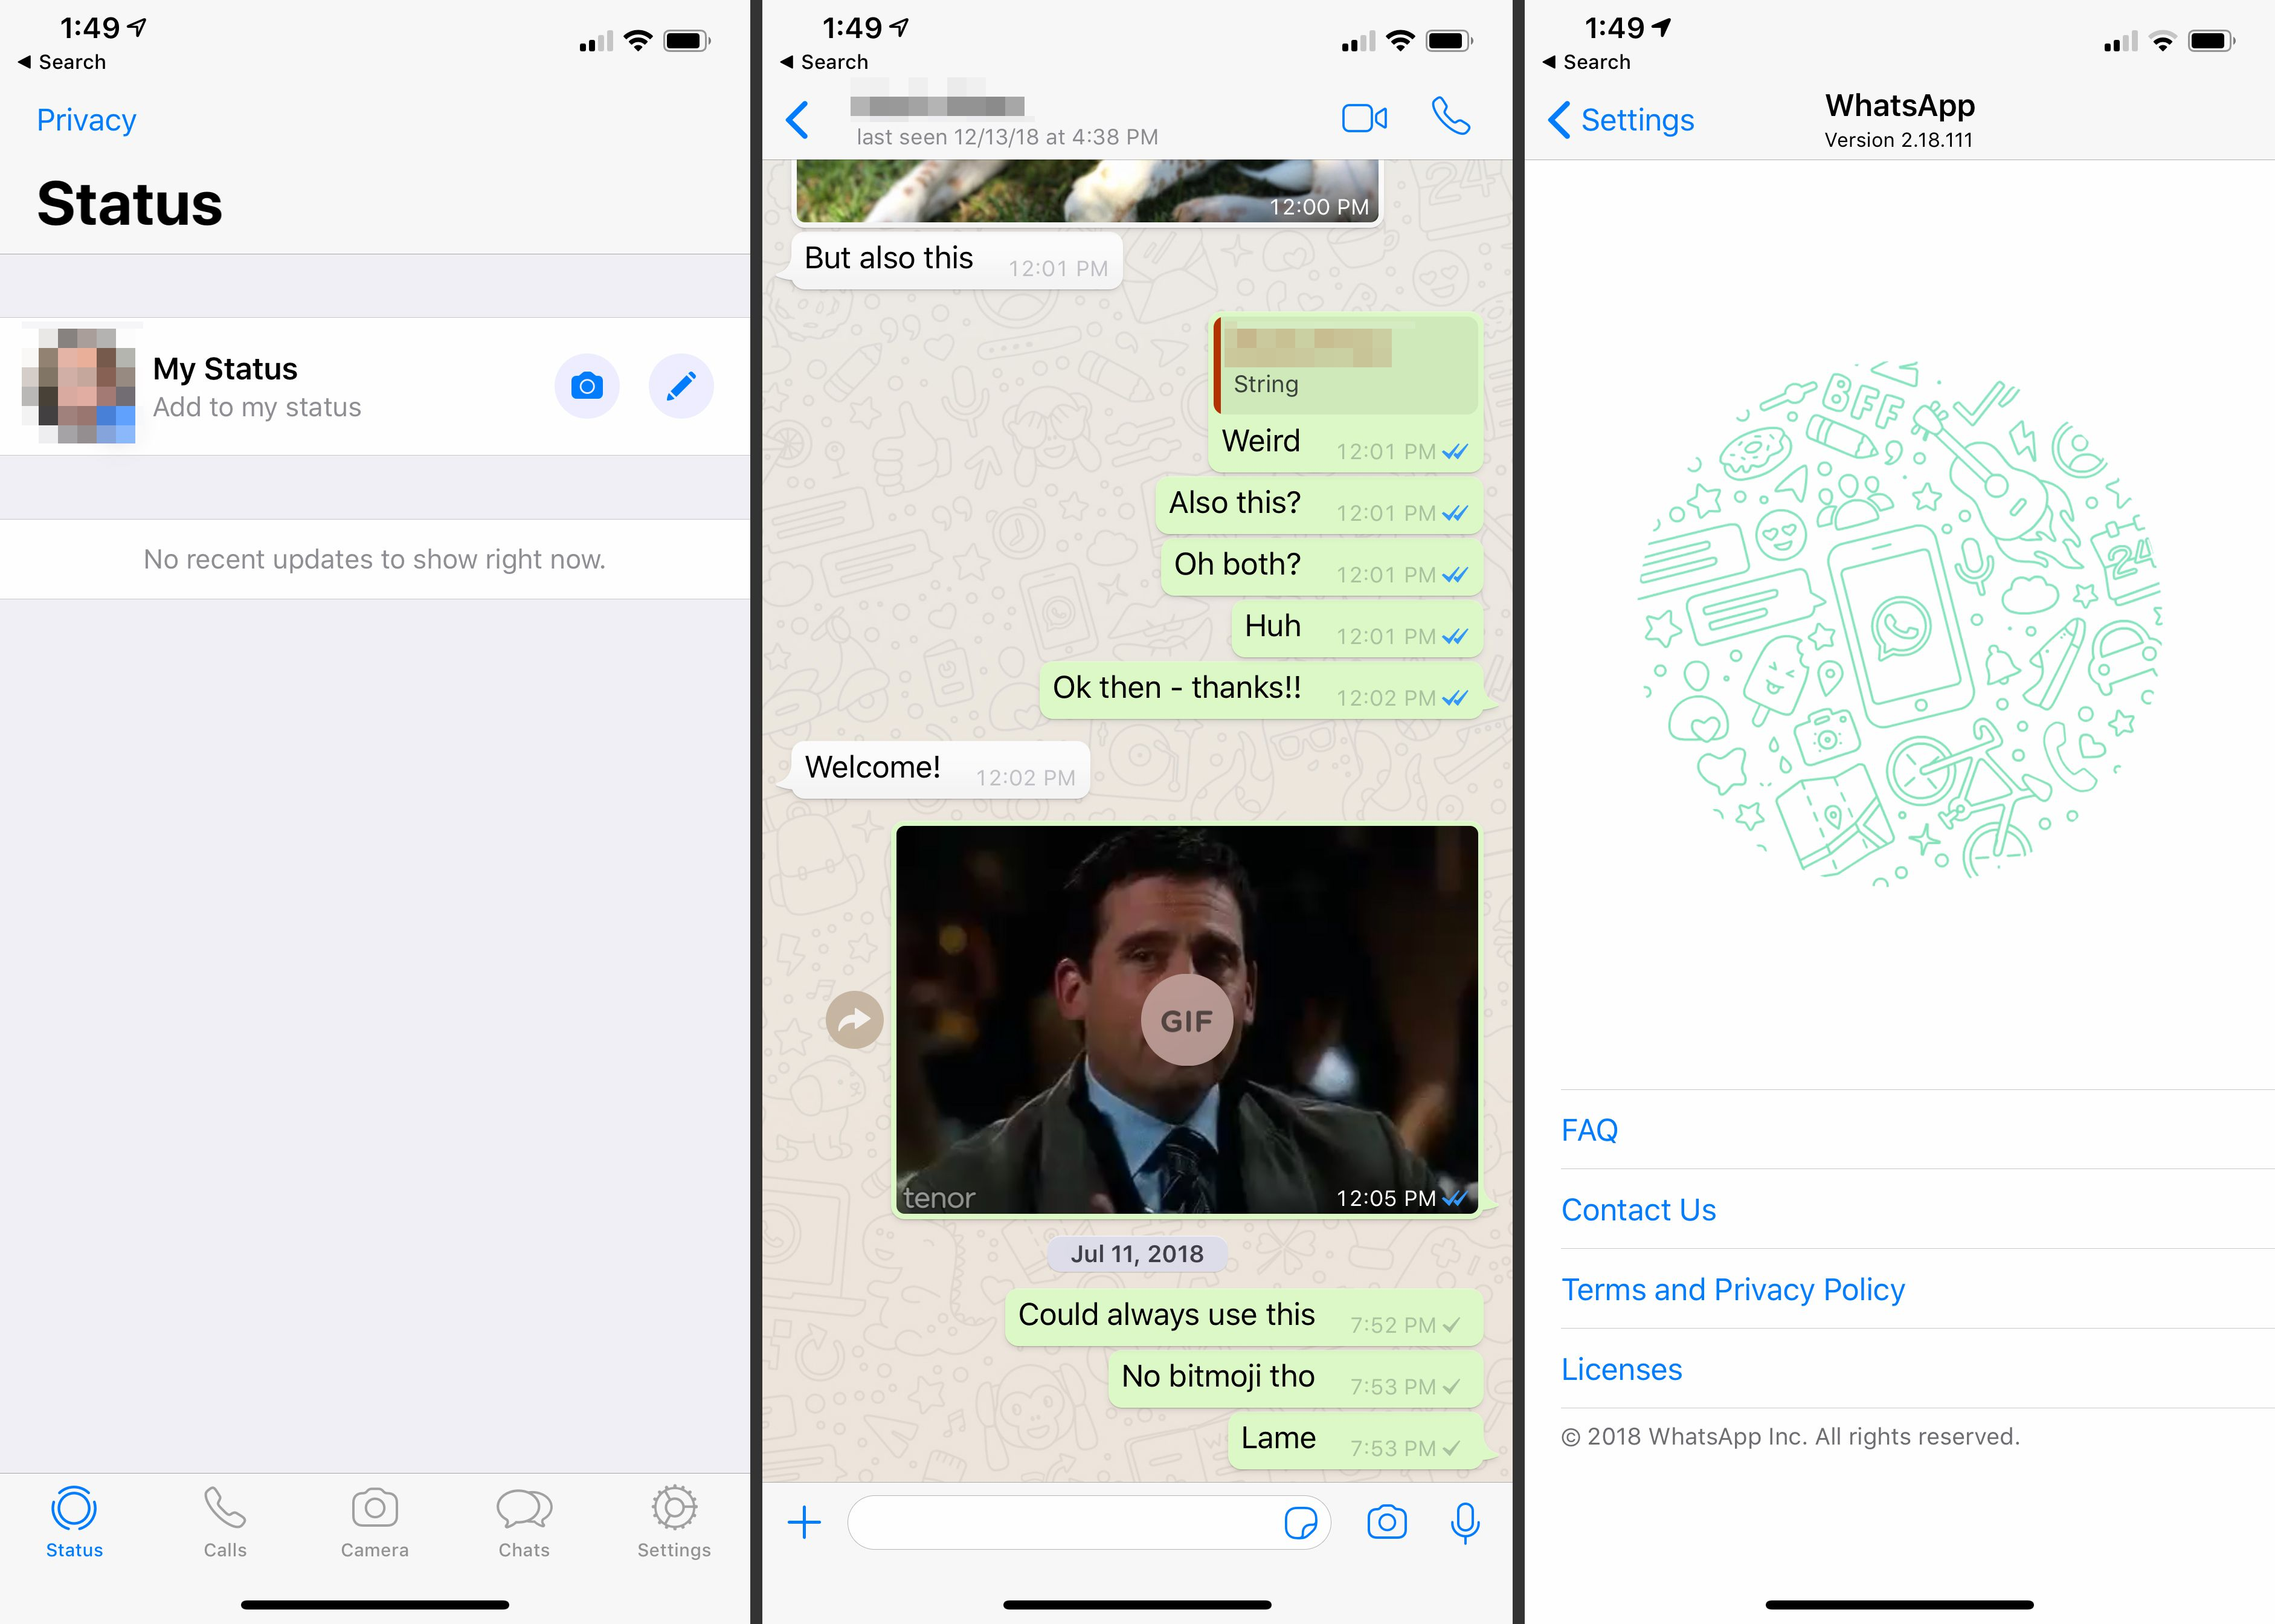 Three WhatsApp screens on iOS